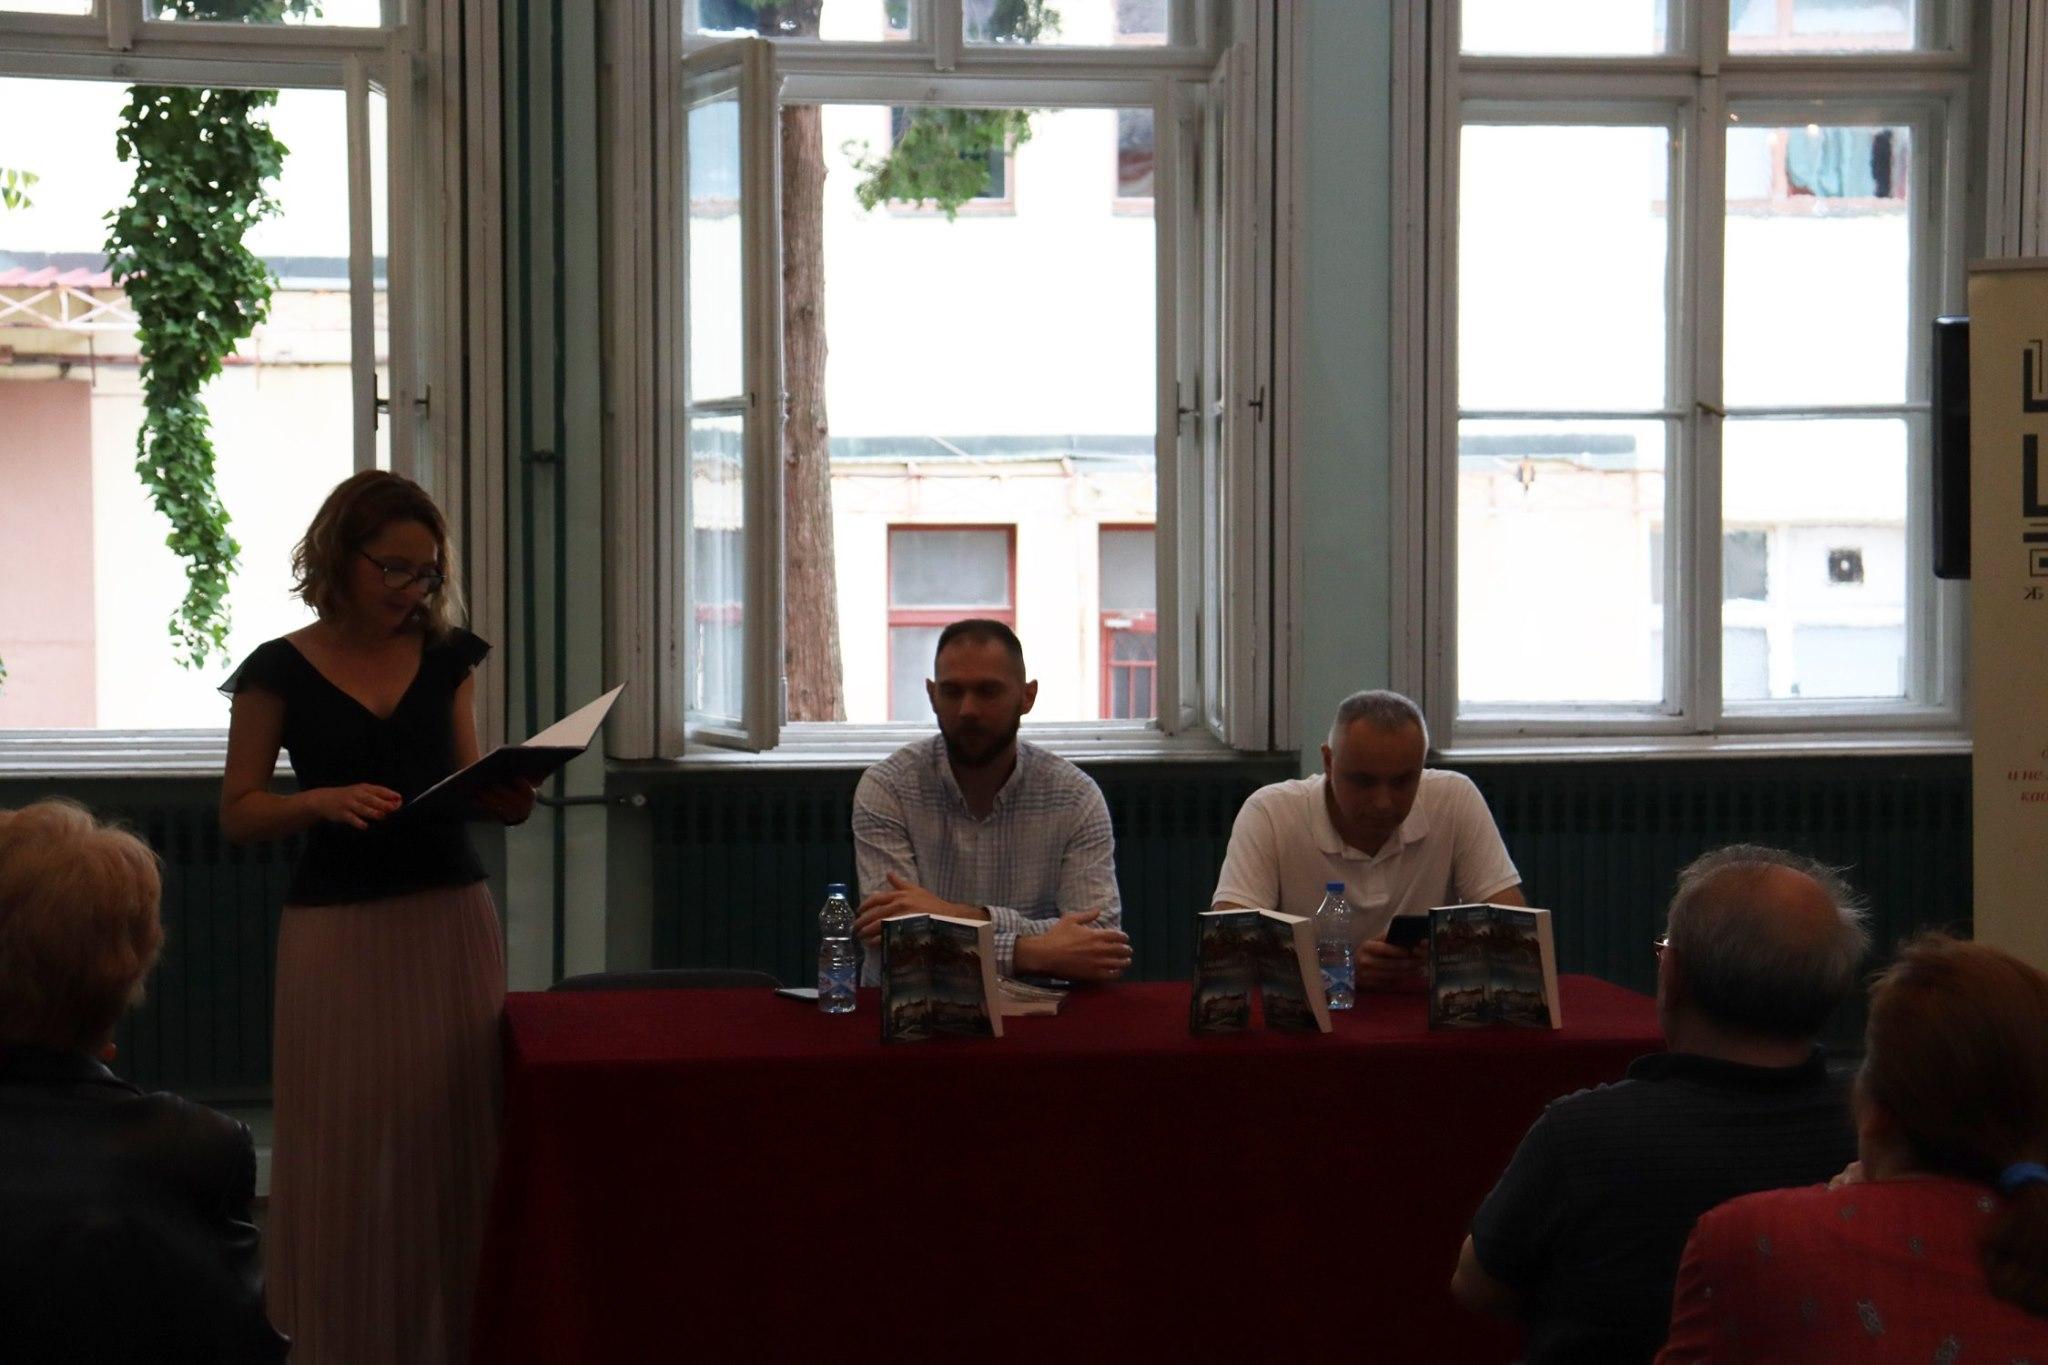 http://www.biblioso.org.rs/public/uploads/galerija/247/borislav_kosanovic-23.jpg